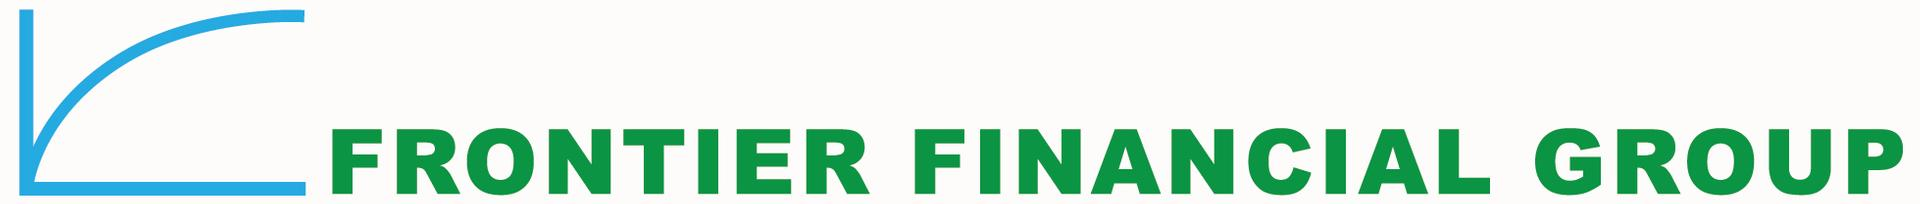 FRONTIER FINANCIAL GROUP logo